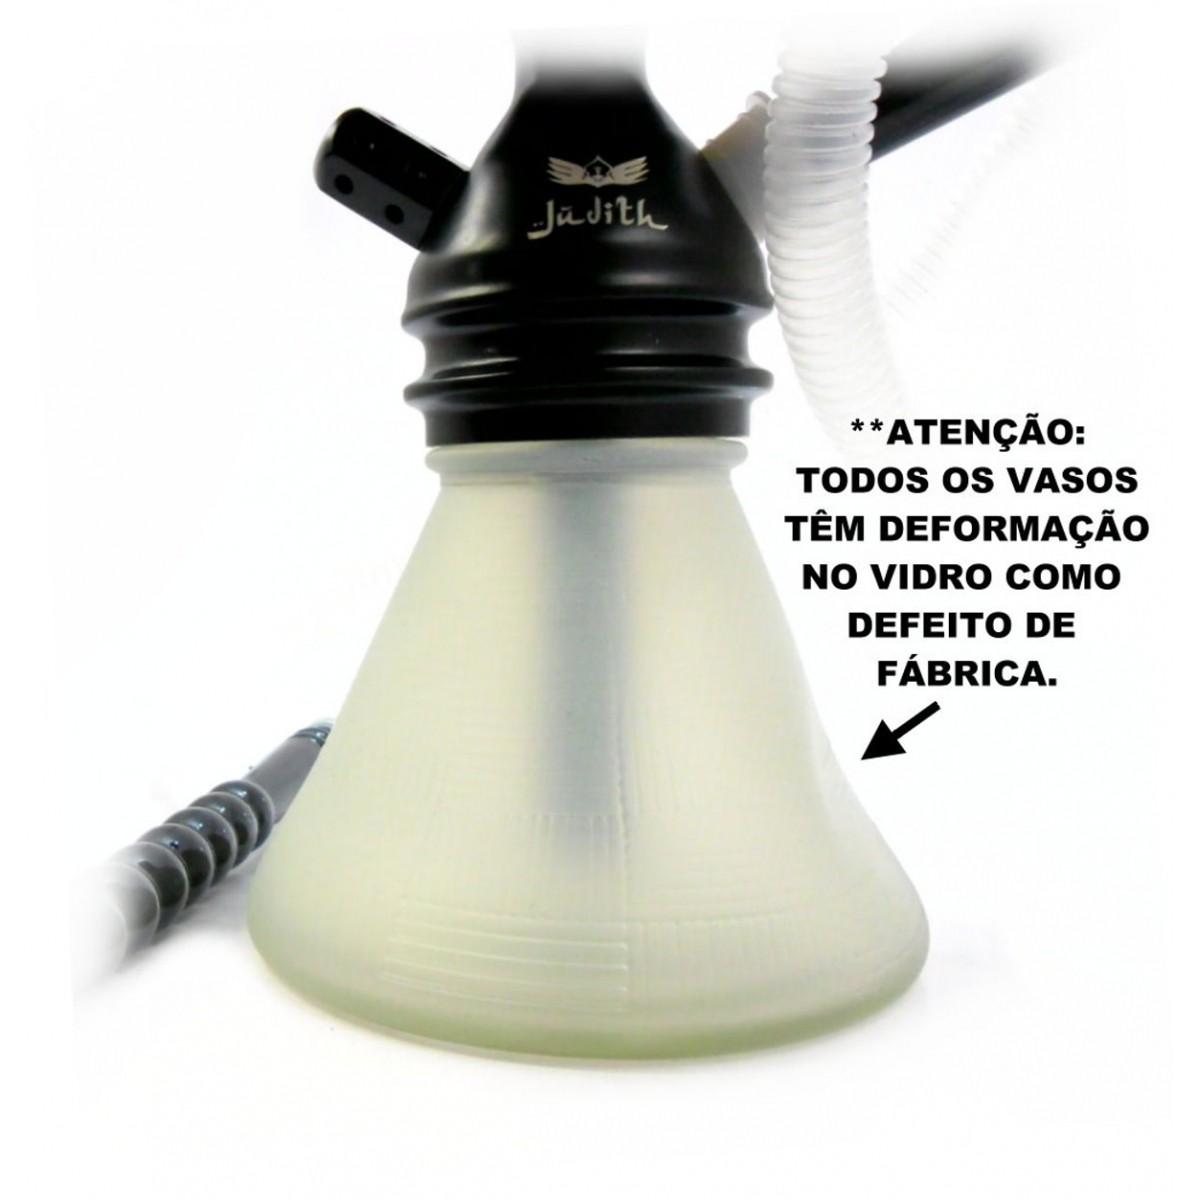 Narguile JUDITH BRANCO 33cm, vaso Petit BRANCO, mangueira corrugada GO HOSE, fornilho funil PRETO, prato El Nefes PRETO